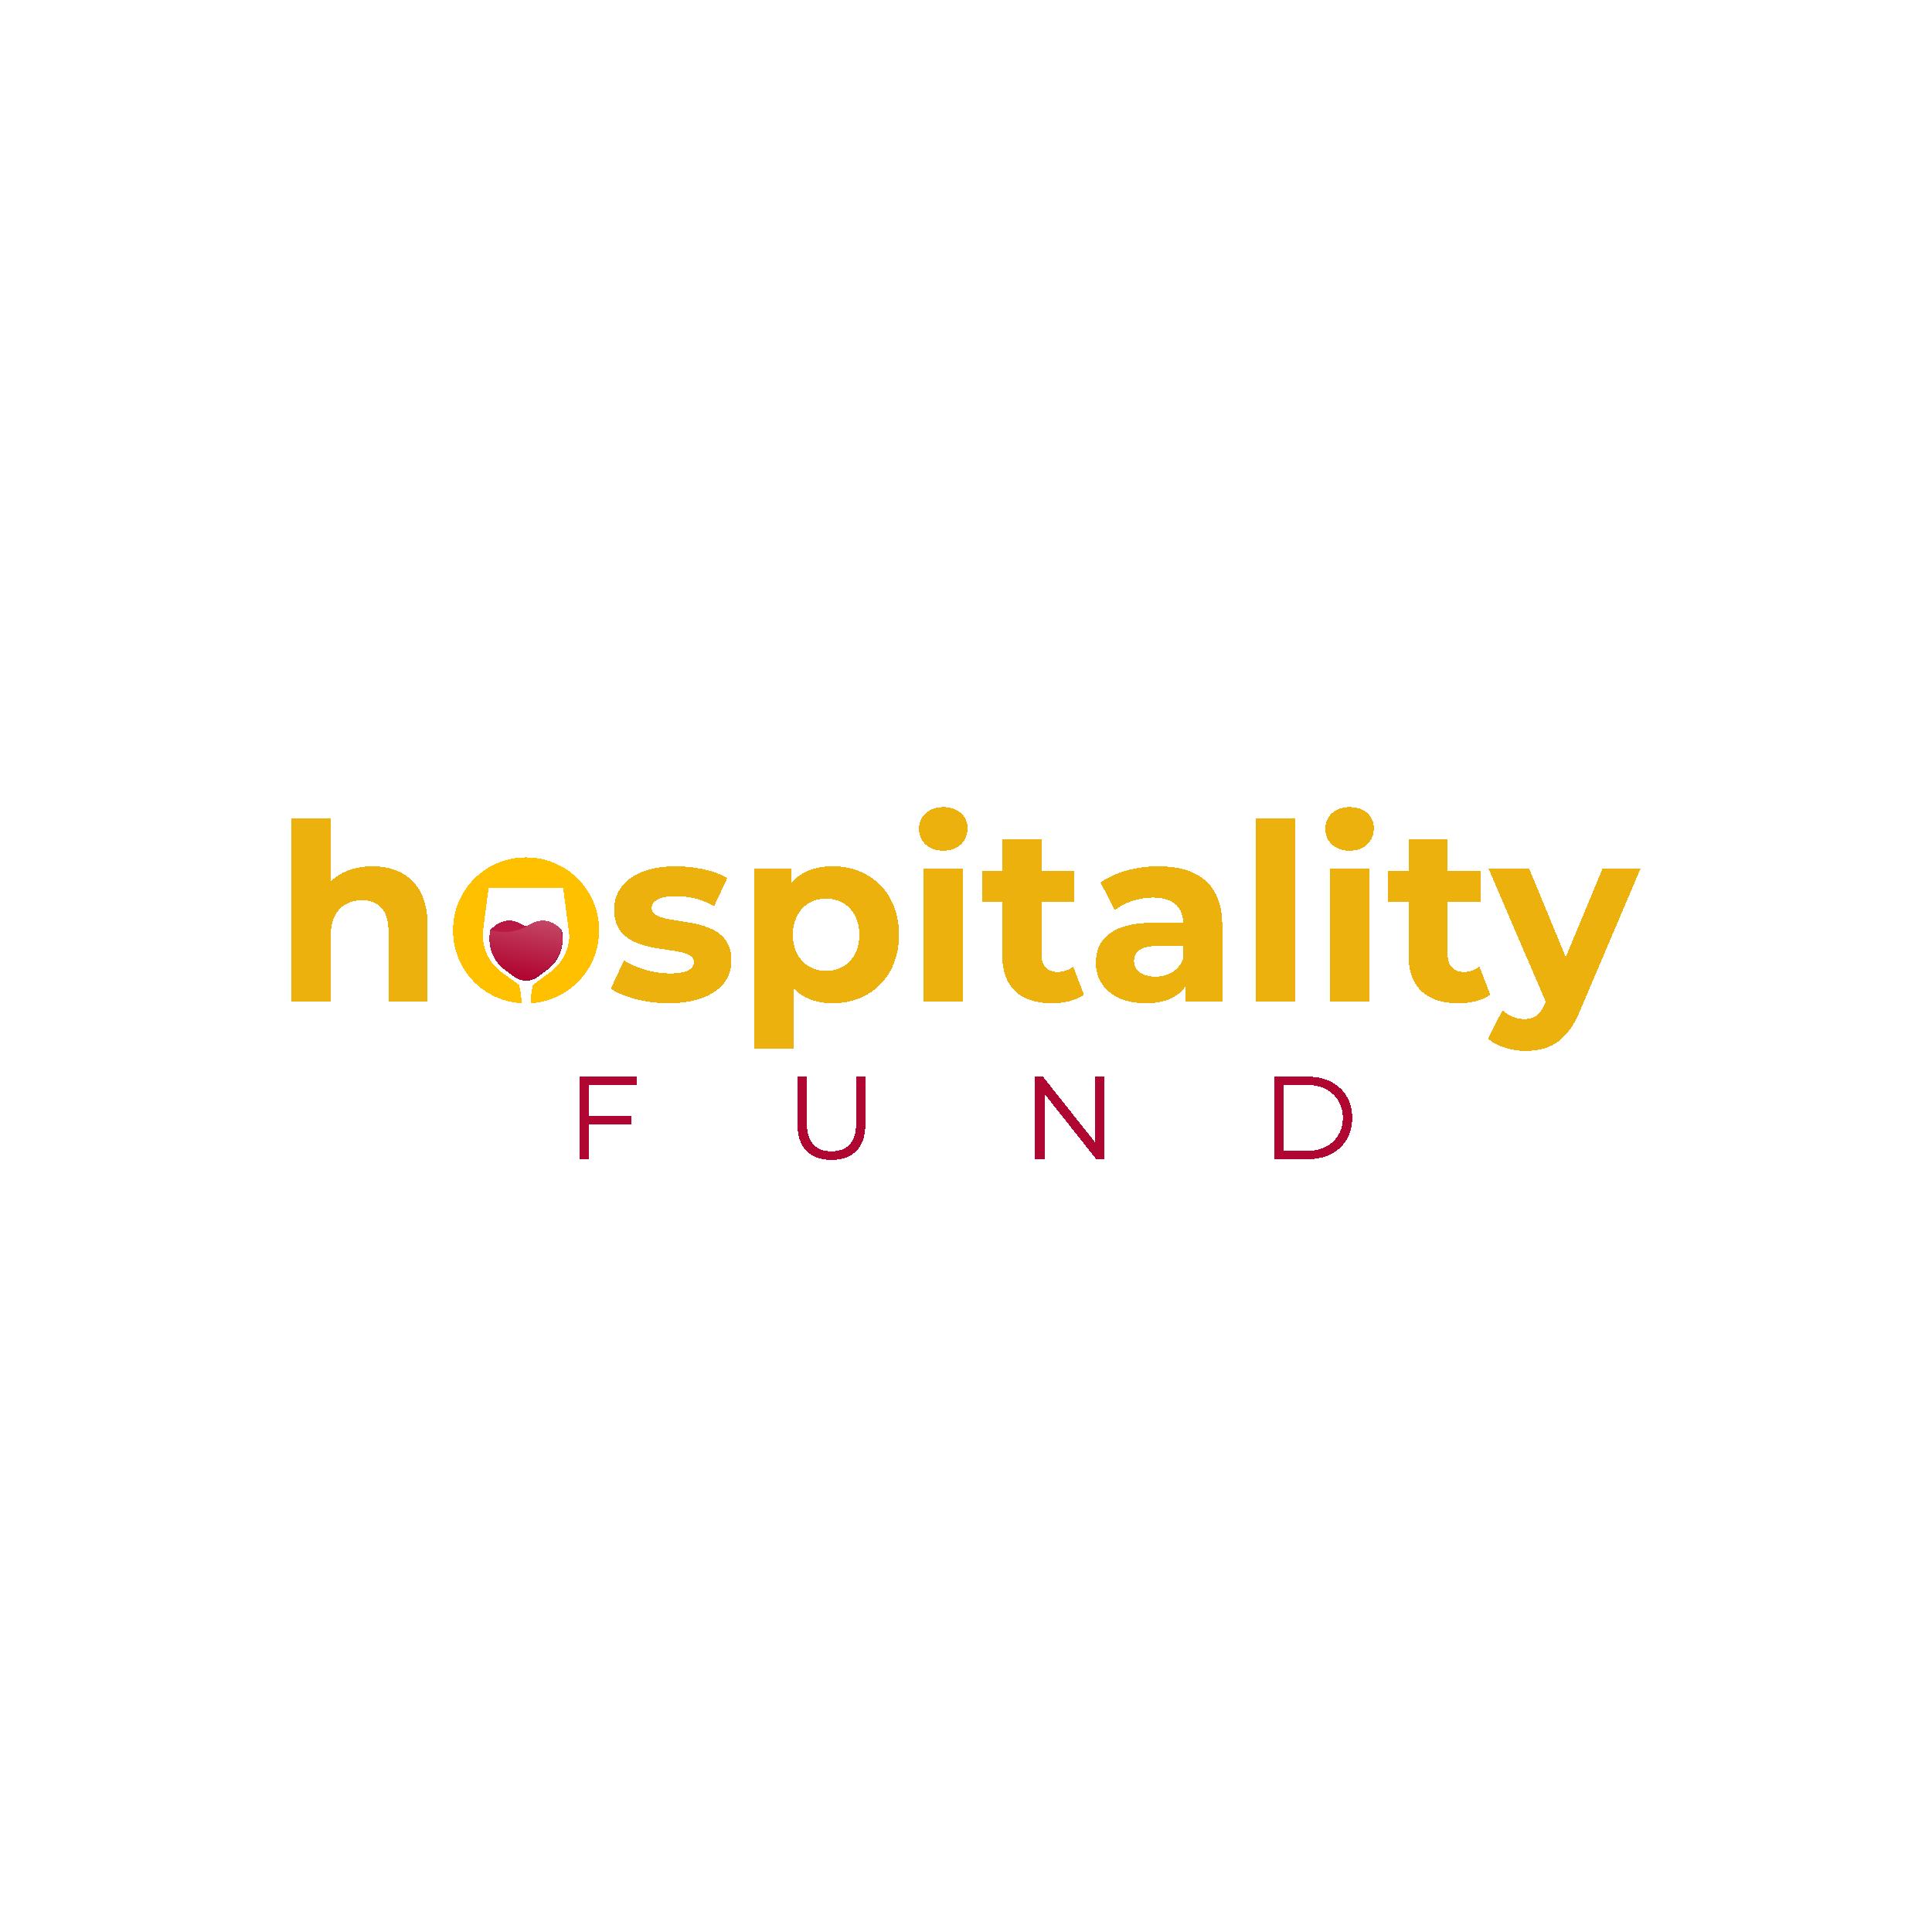 Hospitality Fund Logo